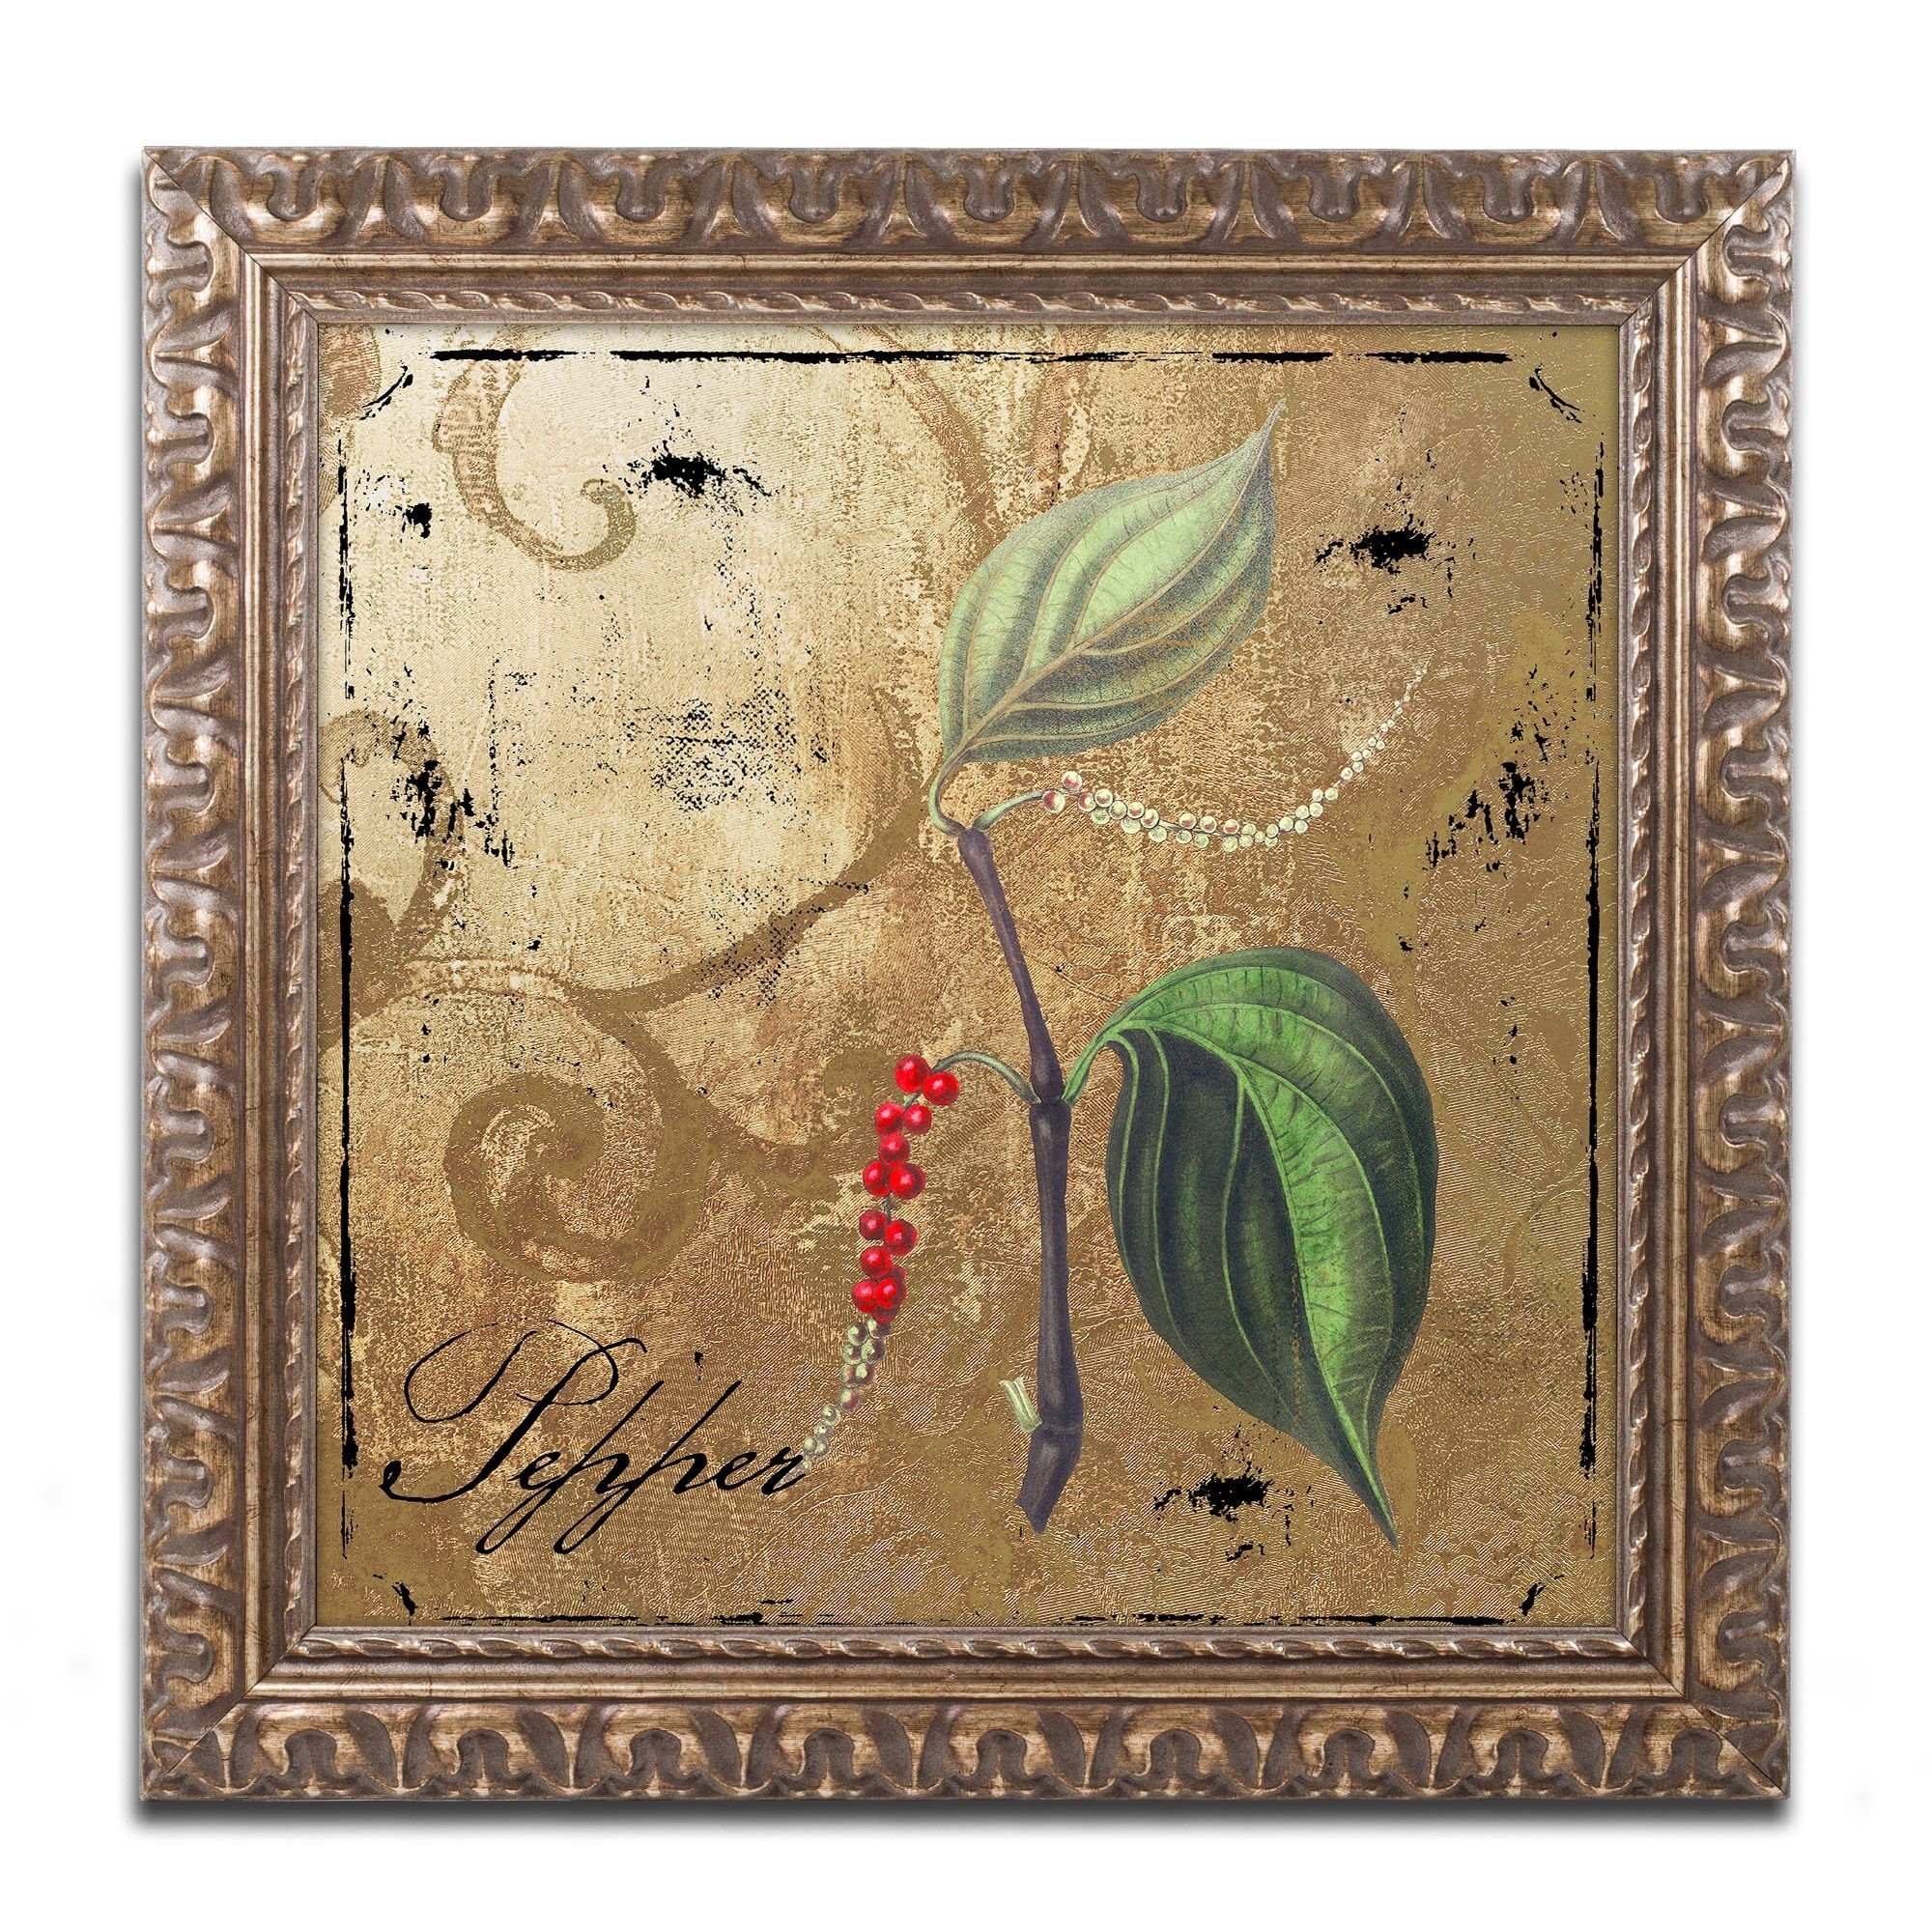 Color bakery ublack gold herbs iiiu ornate framed art products